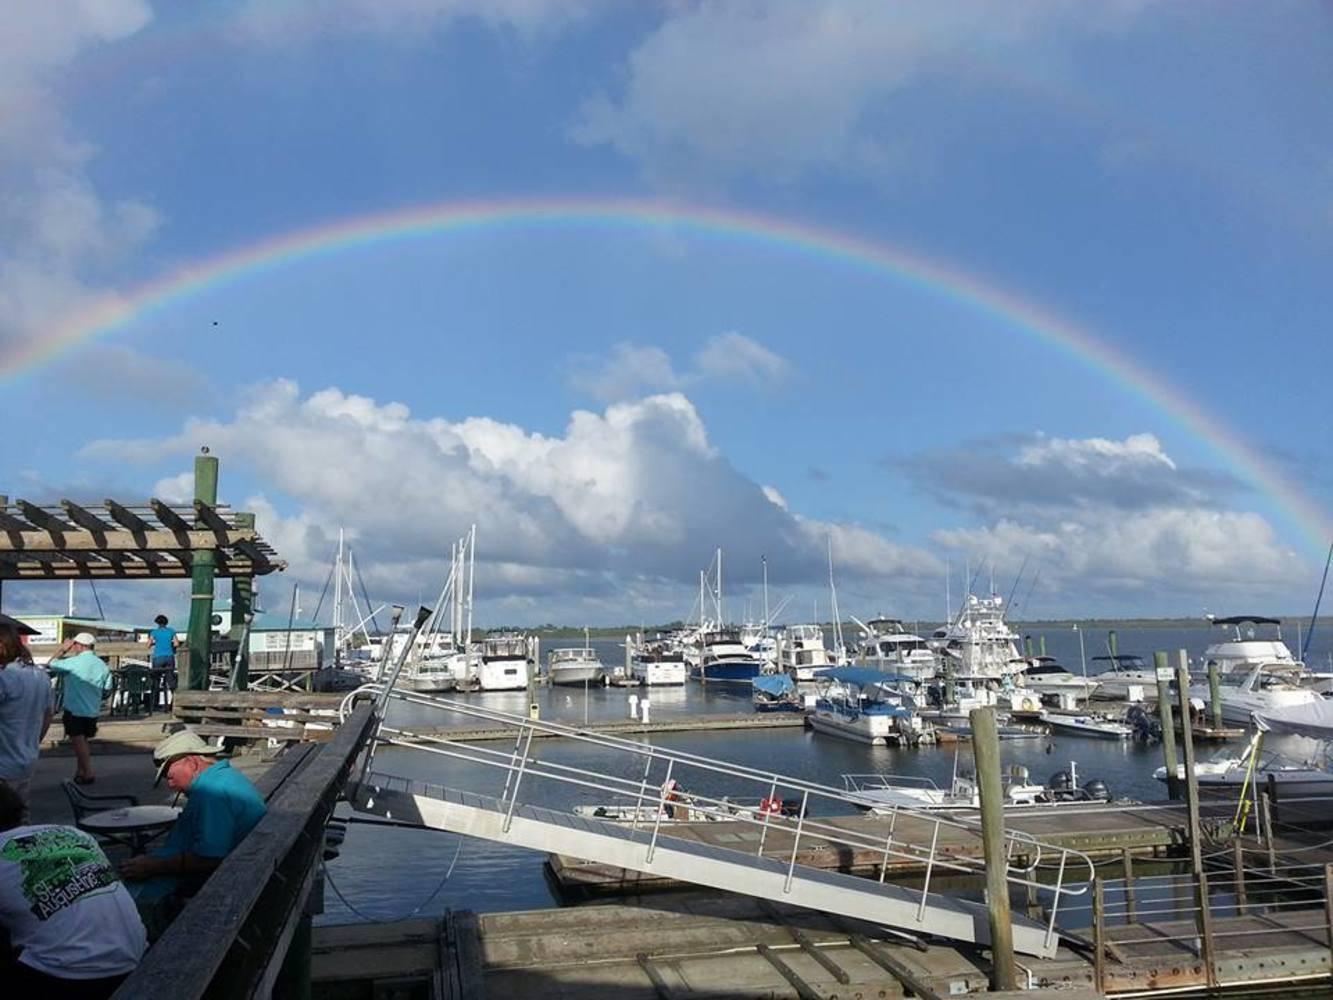 The Conch House Marina Resort Slip Dock Mooring